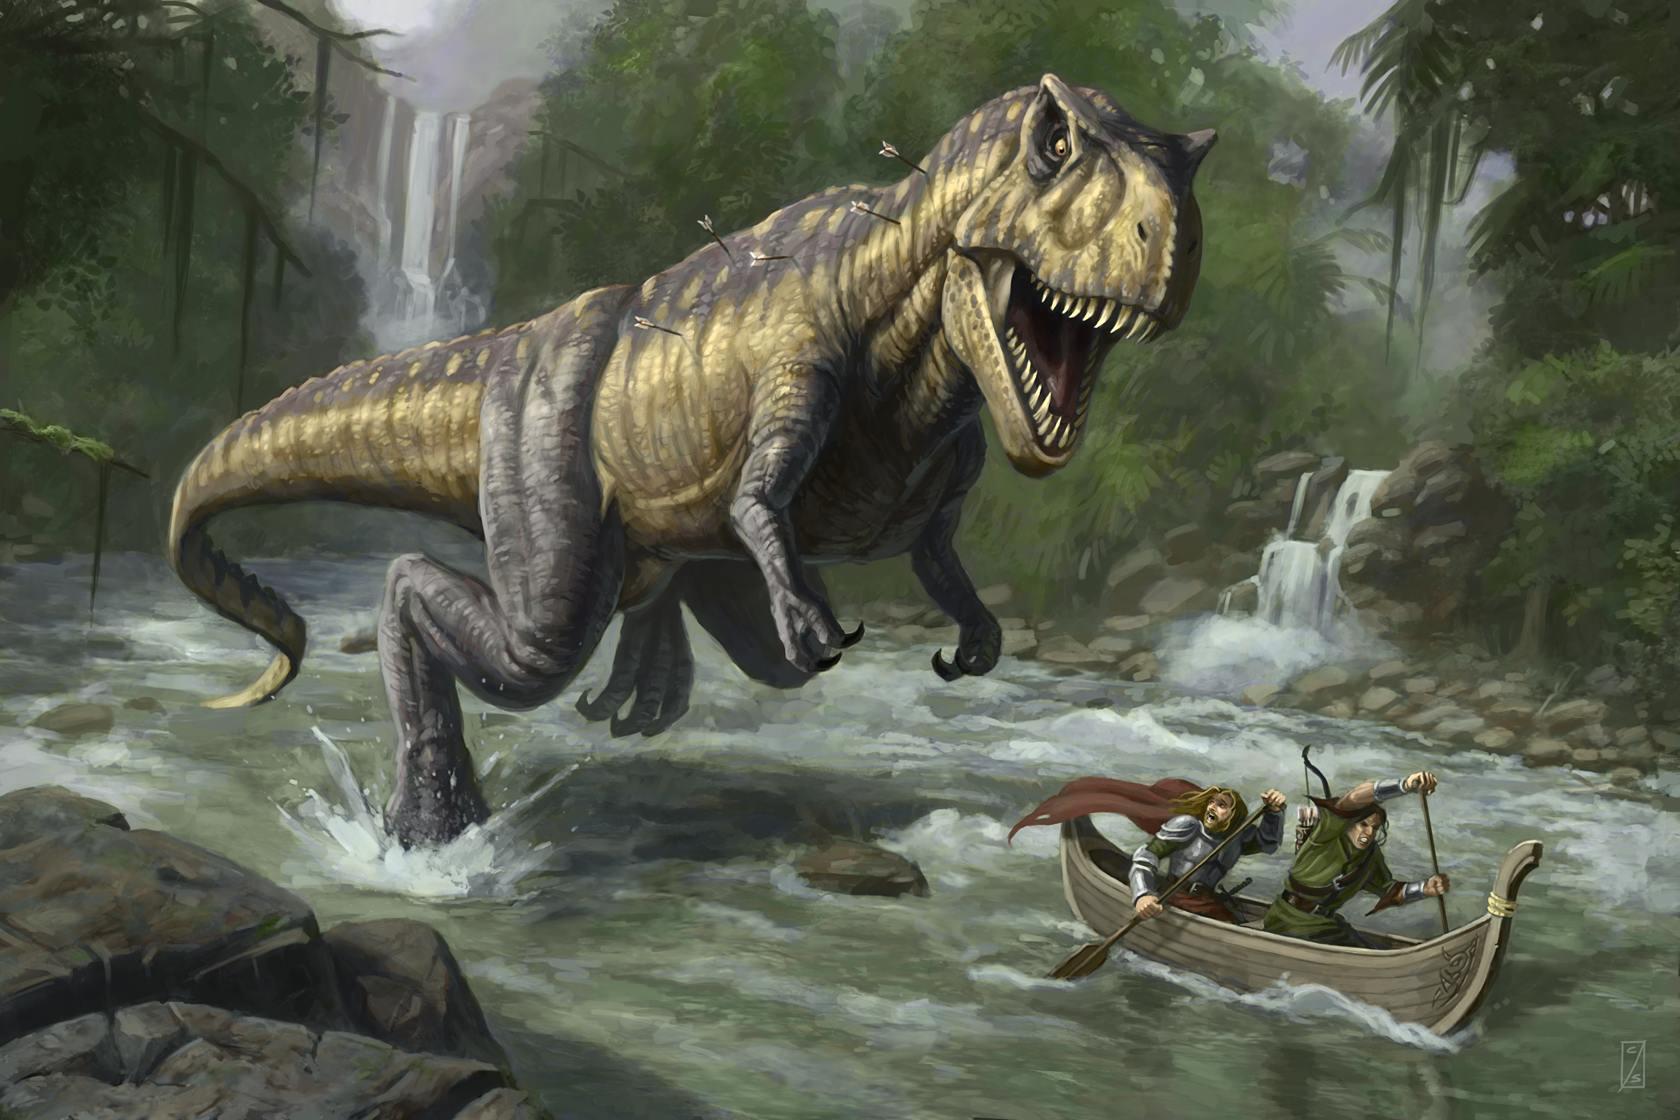 River dinosaur